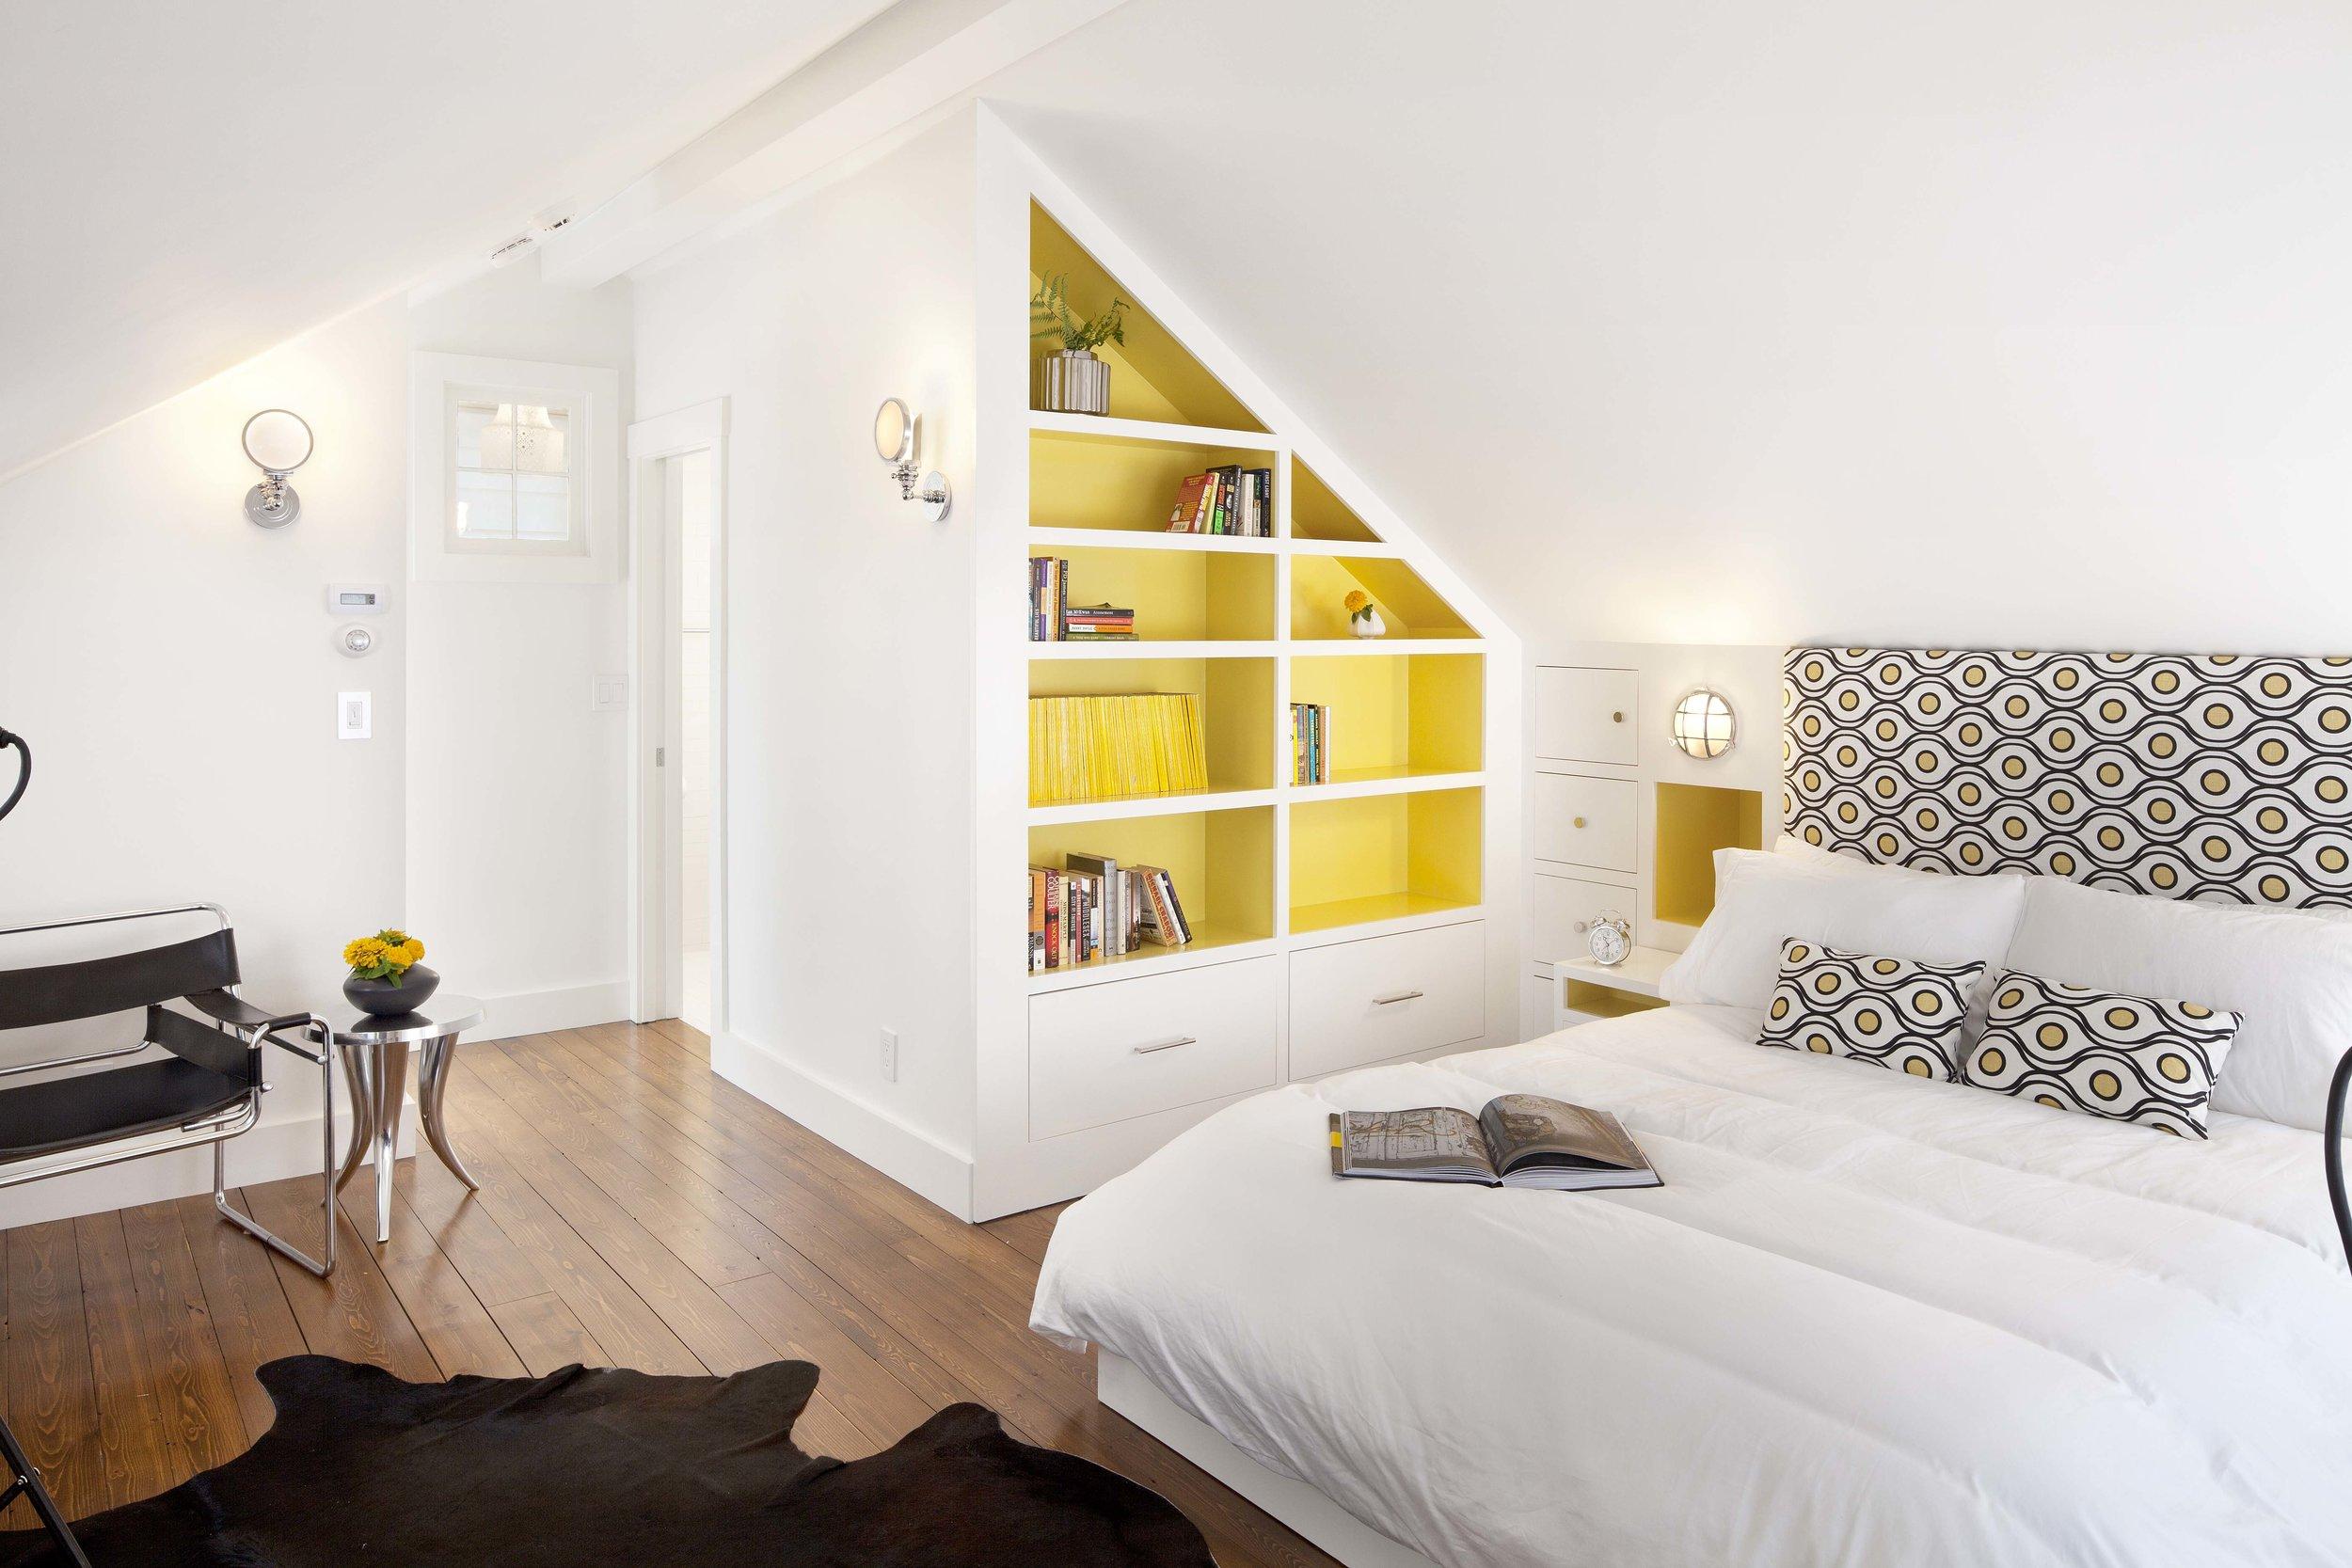 White bedroom with yellow bookshelf detail.